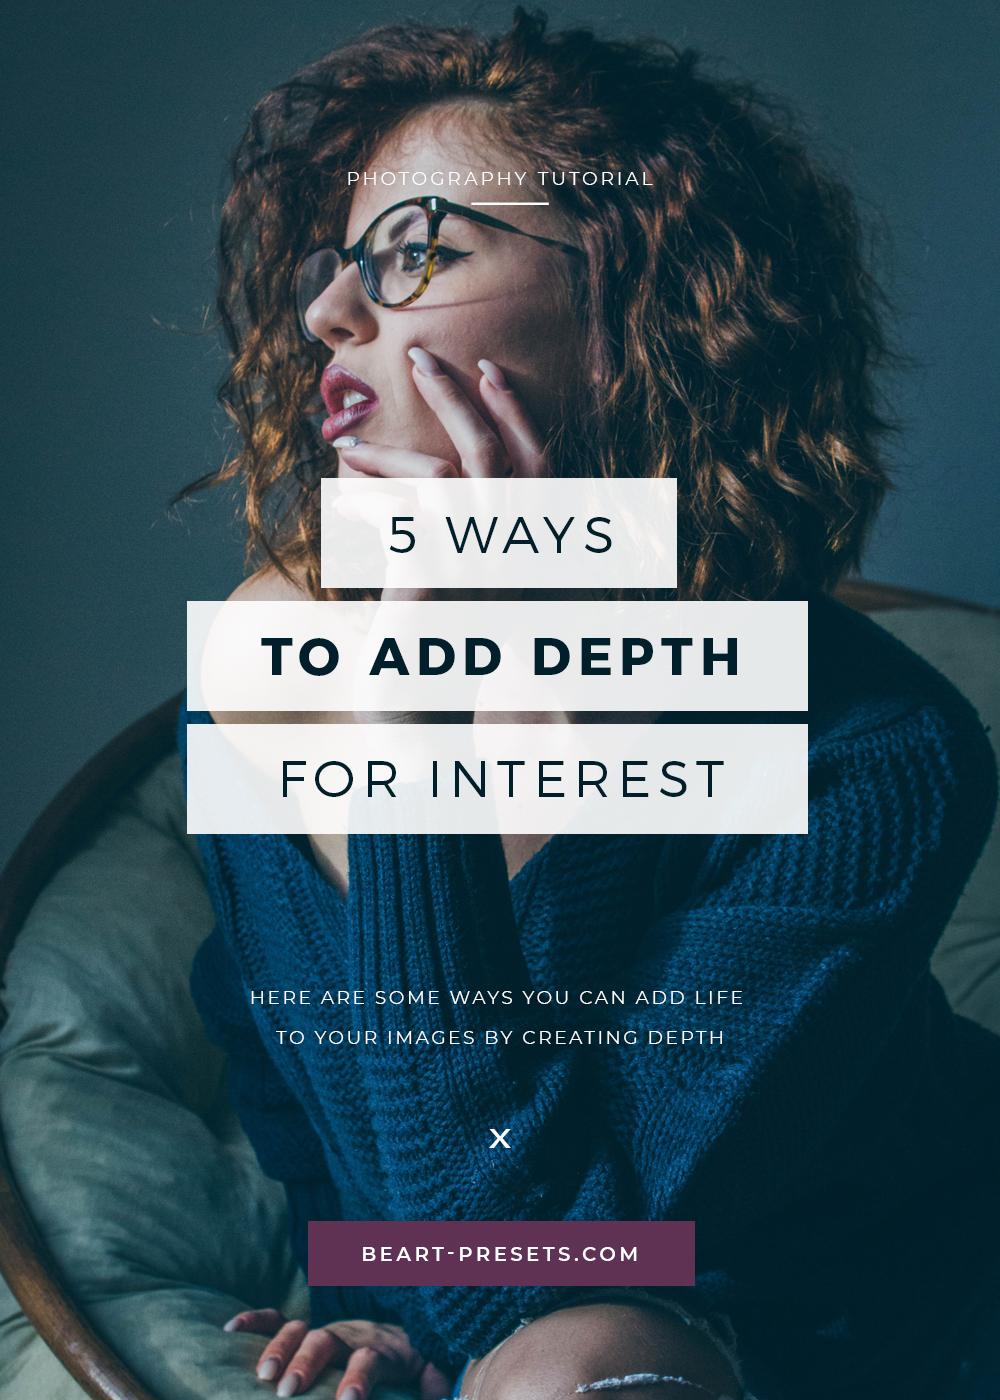 add depth for interest